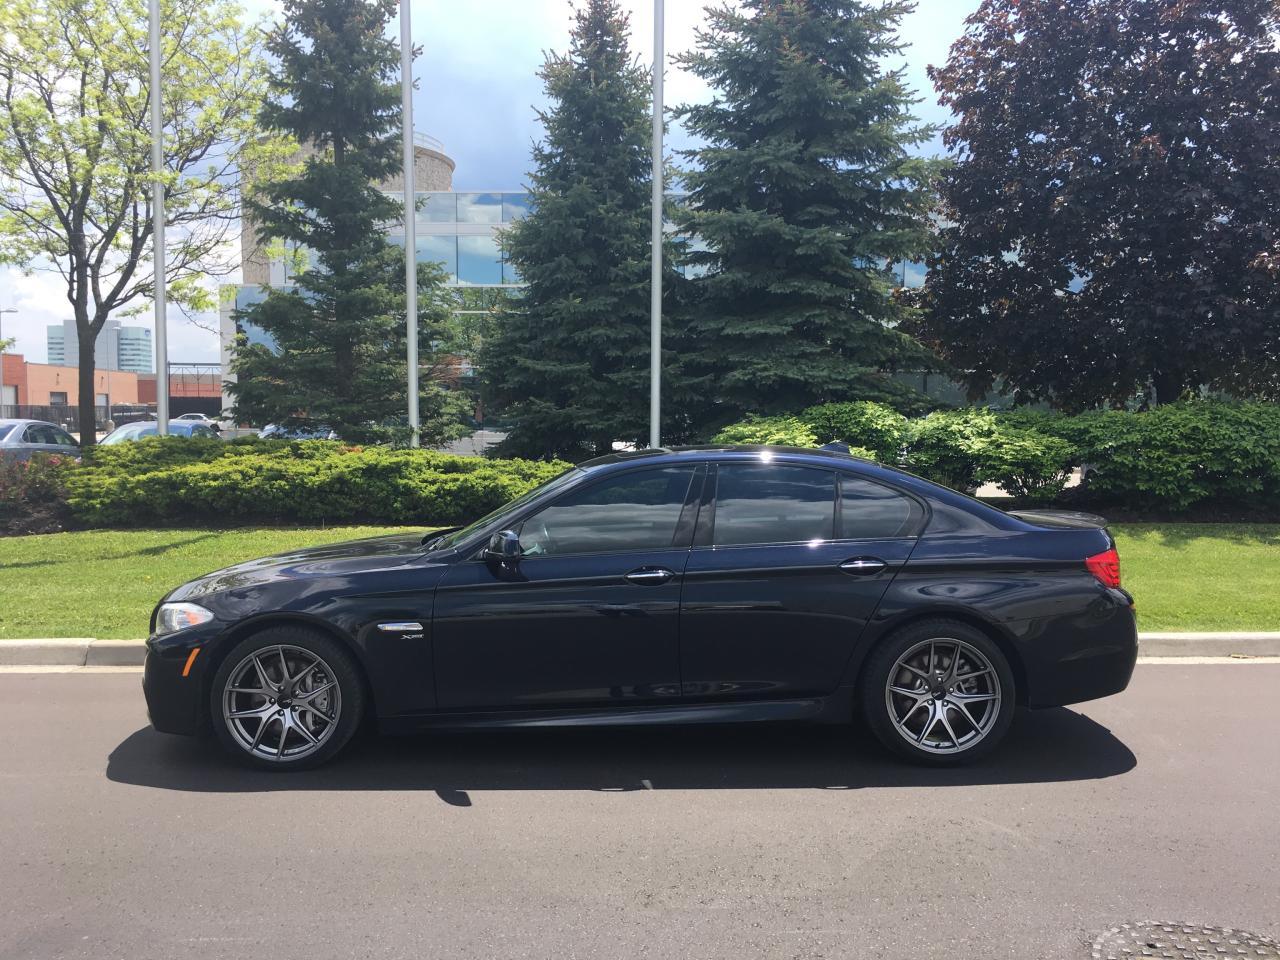 Photo of Black 2011 BMW 5 Series